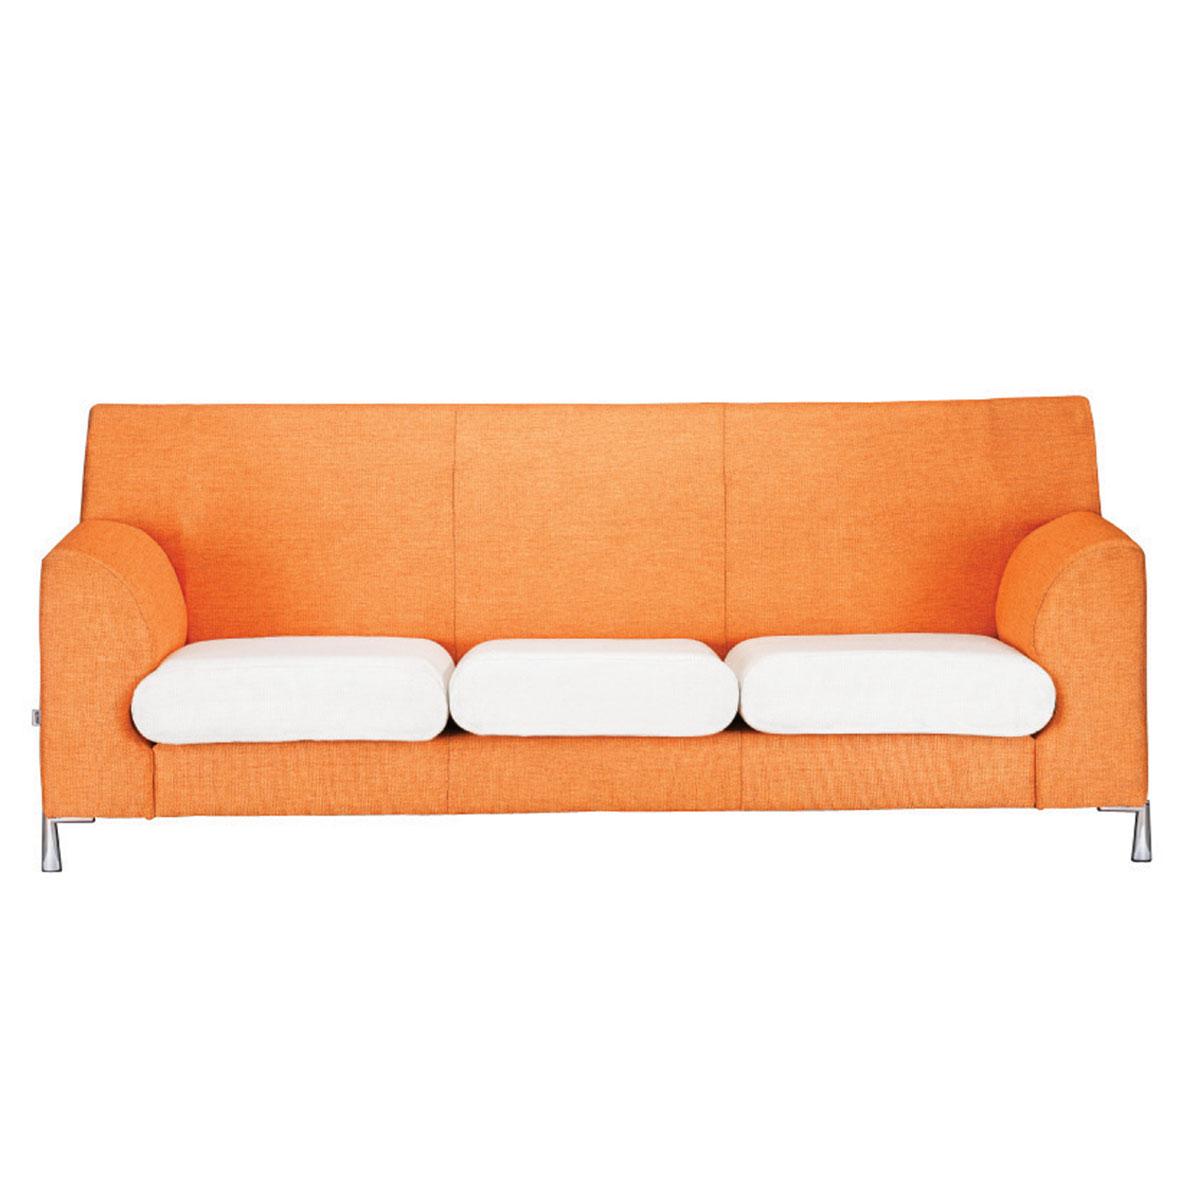 triple seater sofa rosa 3. Black Bedroom Furniture Sets. Home Design Ideas